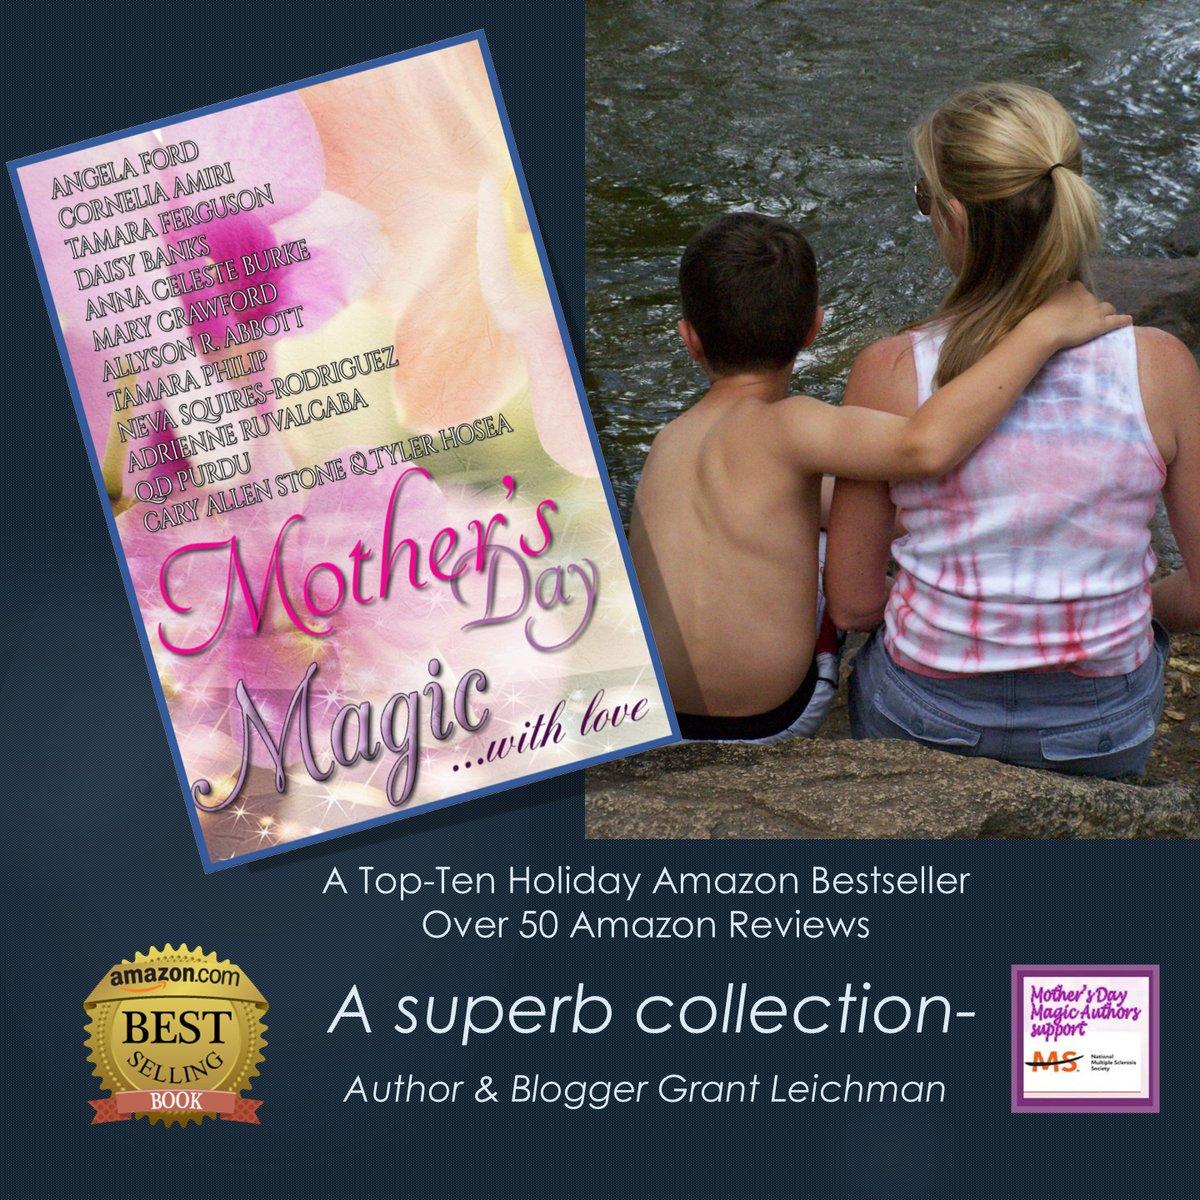 #MothersDay Magic @KissedByFate2 13 Authors LOVE To Mothers Raising $ For MS #ASMSG #IAN1  http:// bookShow.me/B01AVHGNJI  &nbsp;  <br>http://pic.twitter.com/iLxT9bAoTq